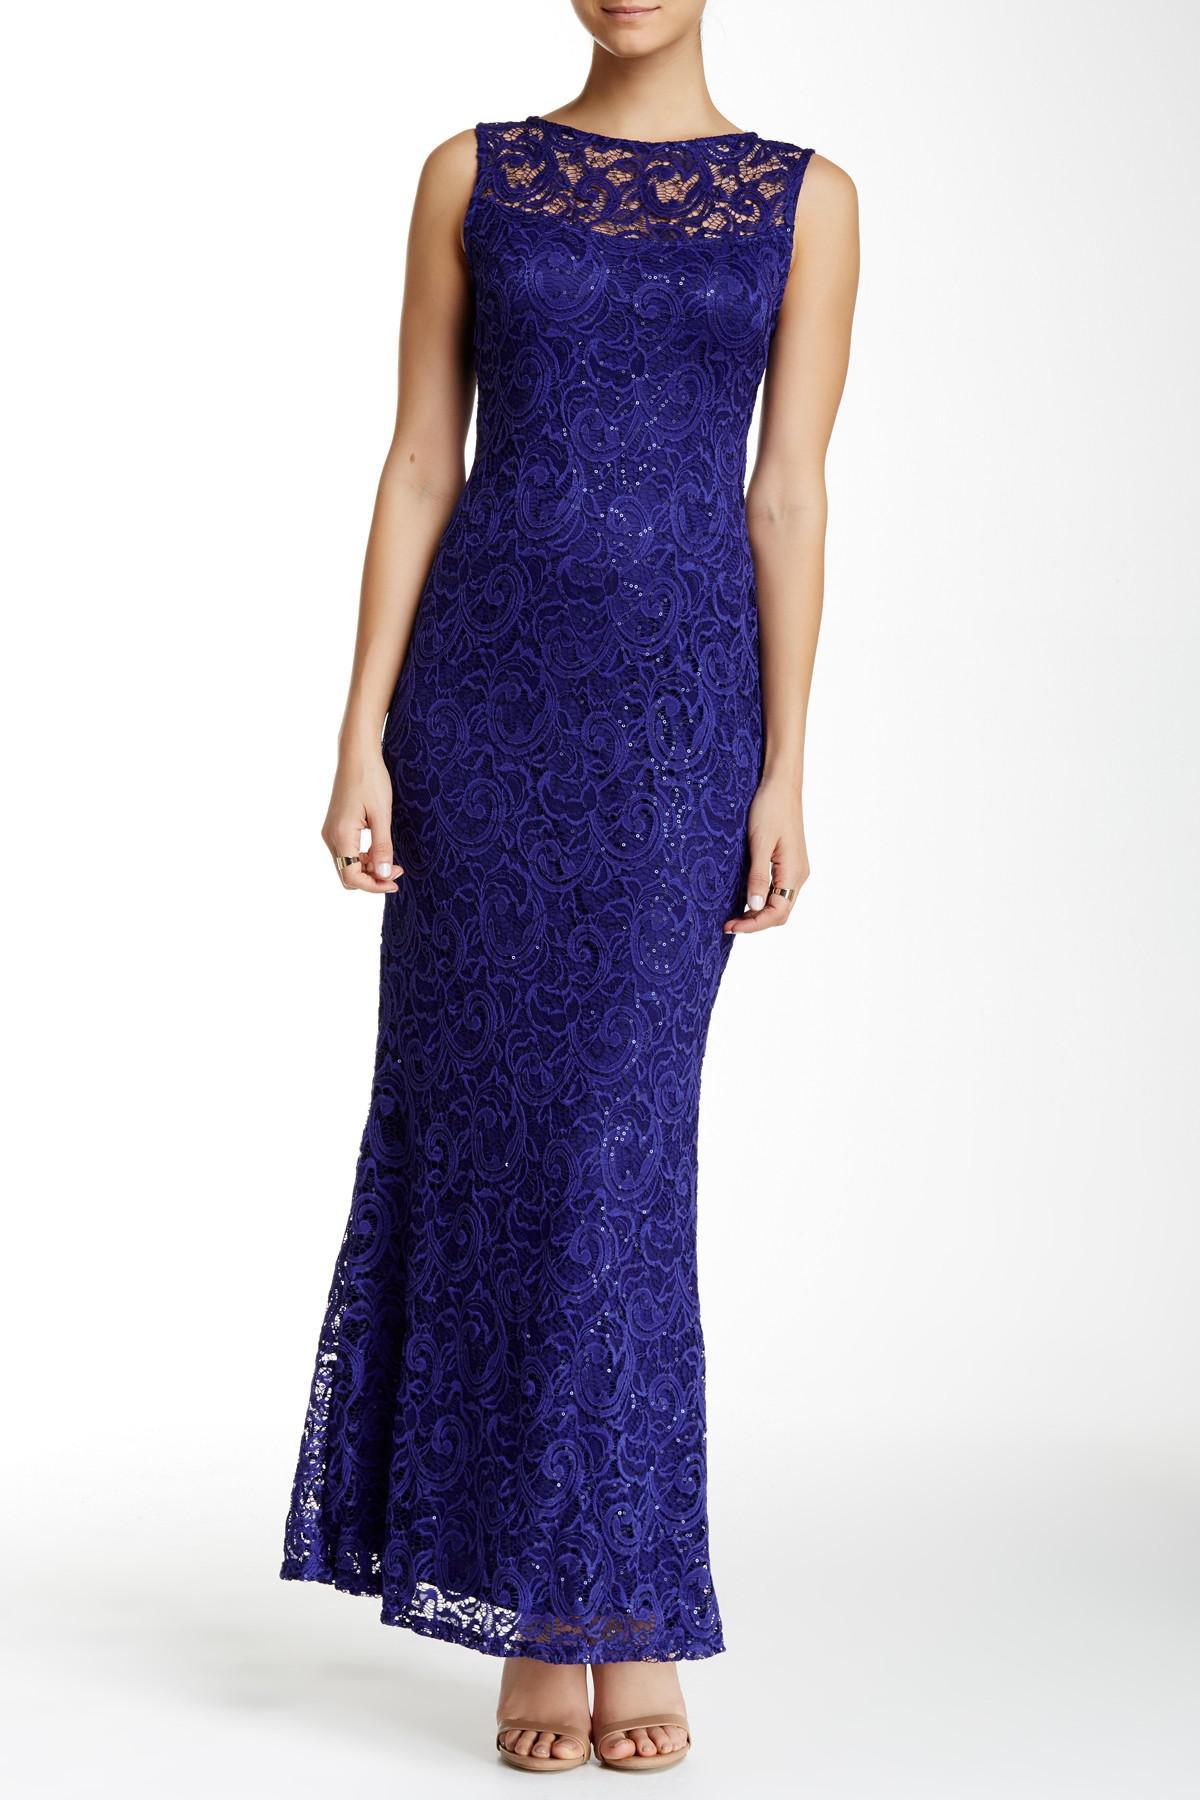 9725fcabf91da5 Lyst - Marina Sleeveless Illusion Yoke Lace Gown in Purple